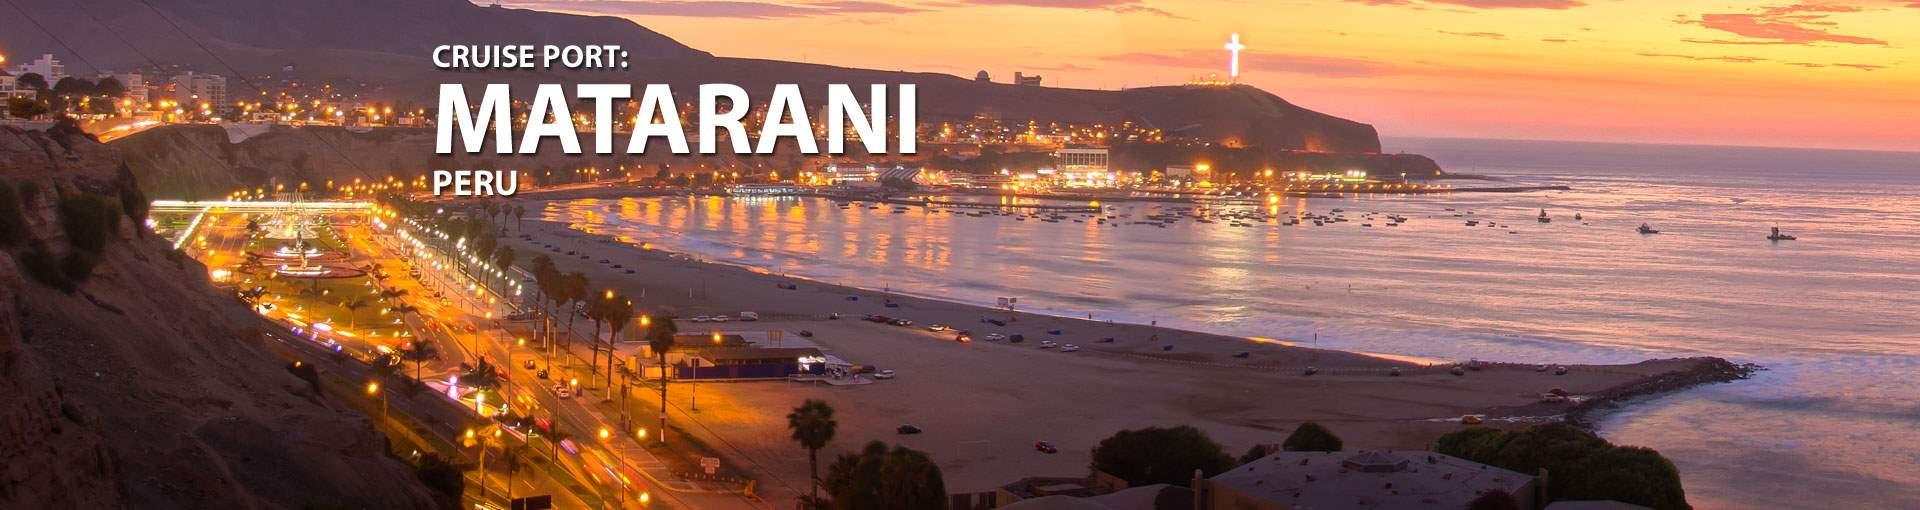 Cruises to Matarani, Peru